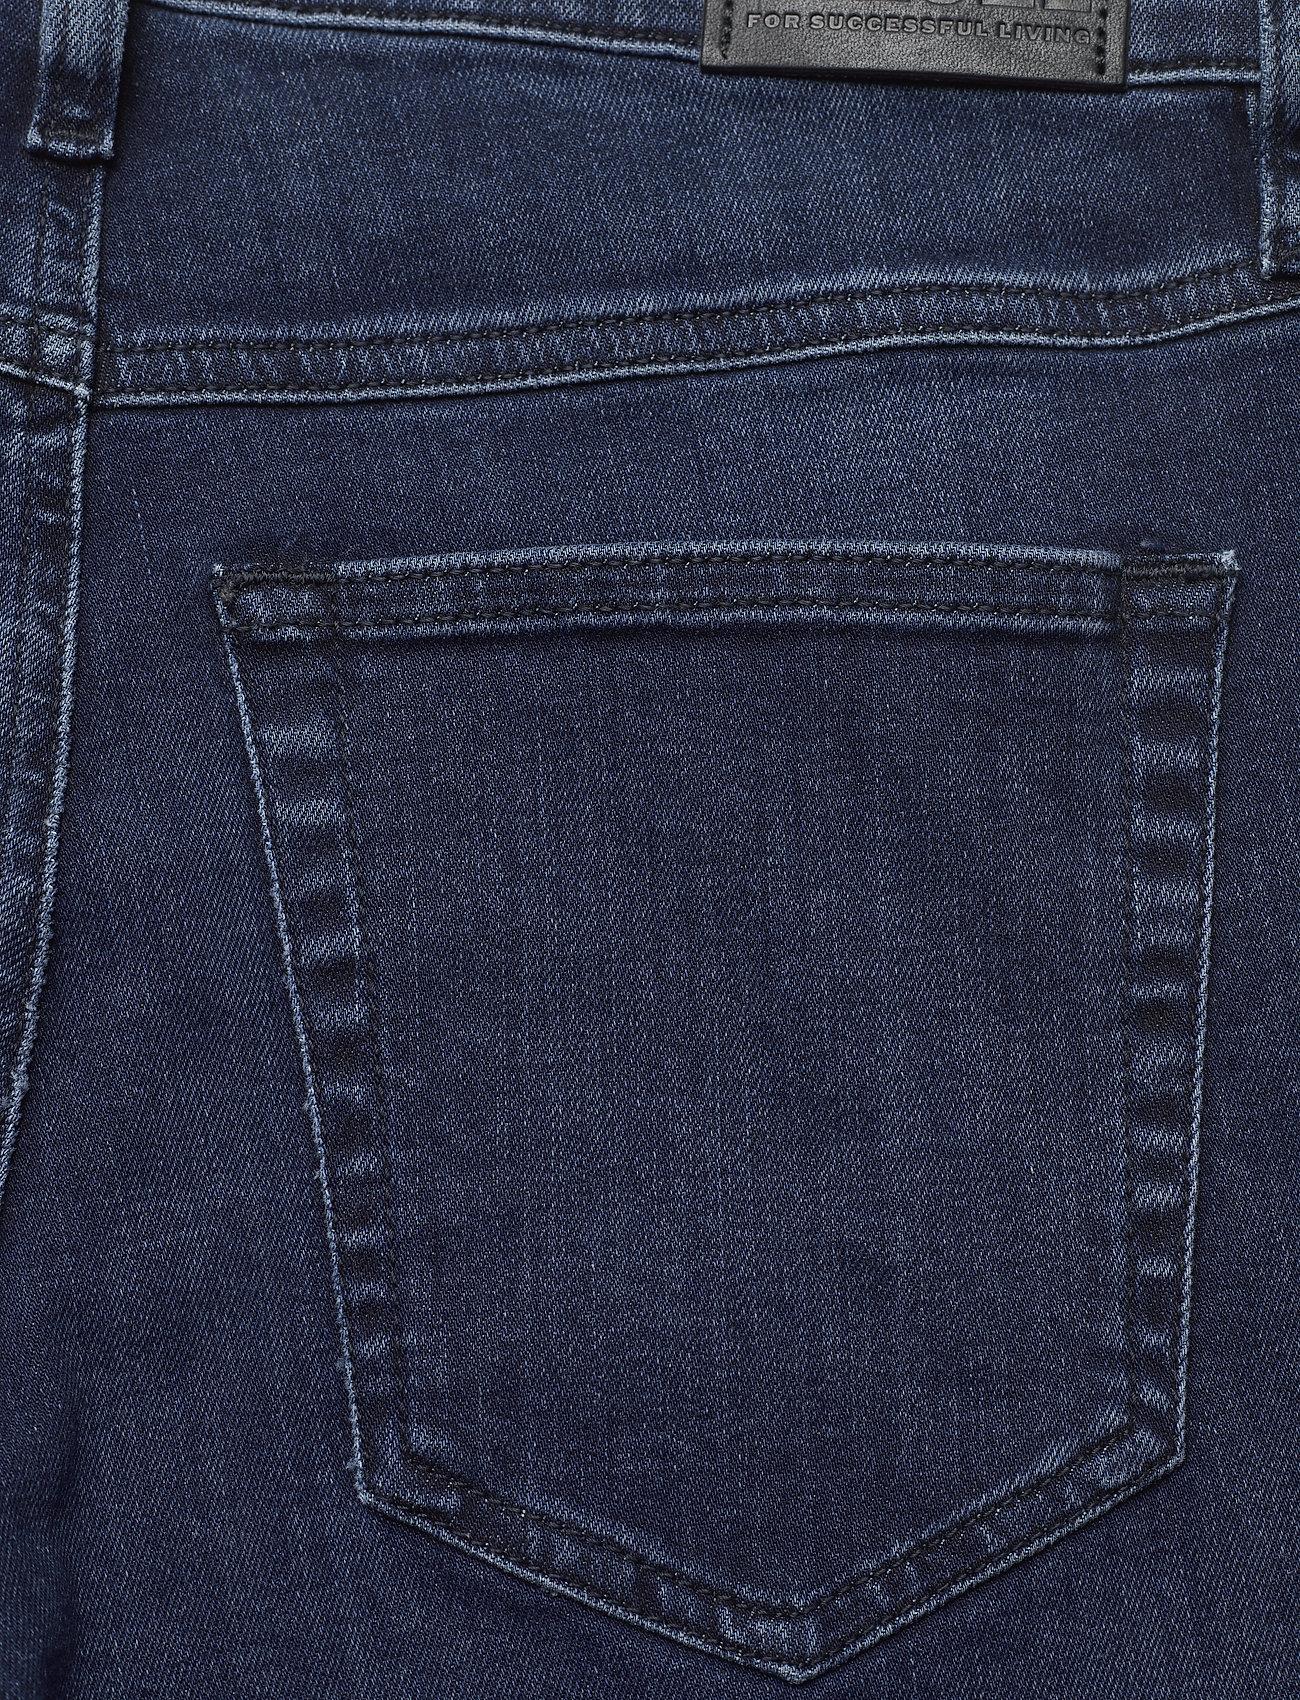 Diesel Women - BABHILA TROUSERS - slim jeans - denim - 1